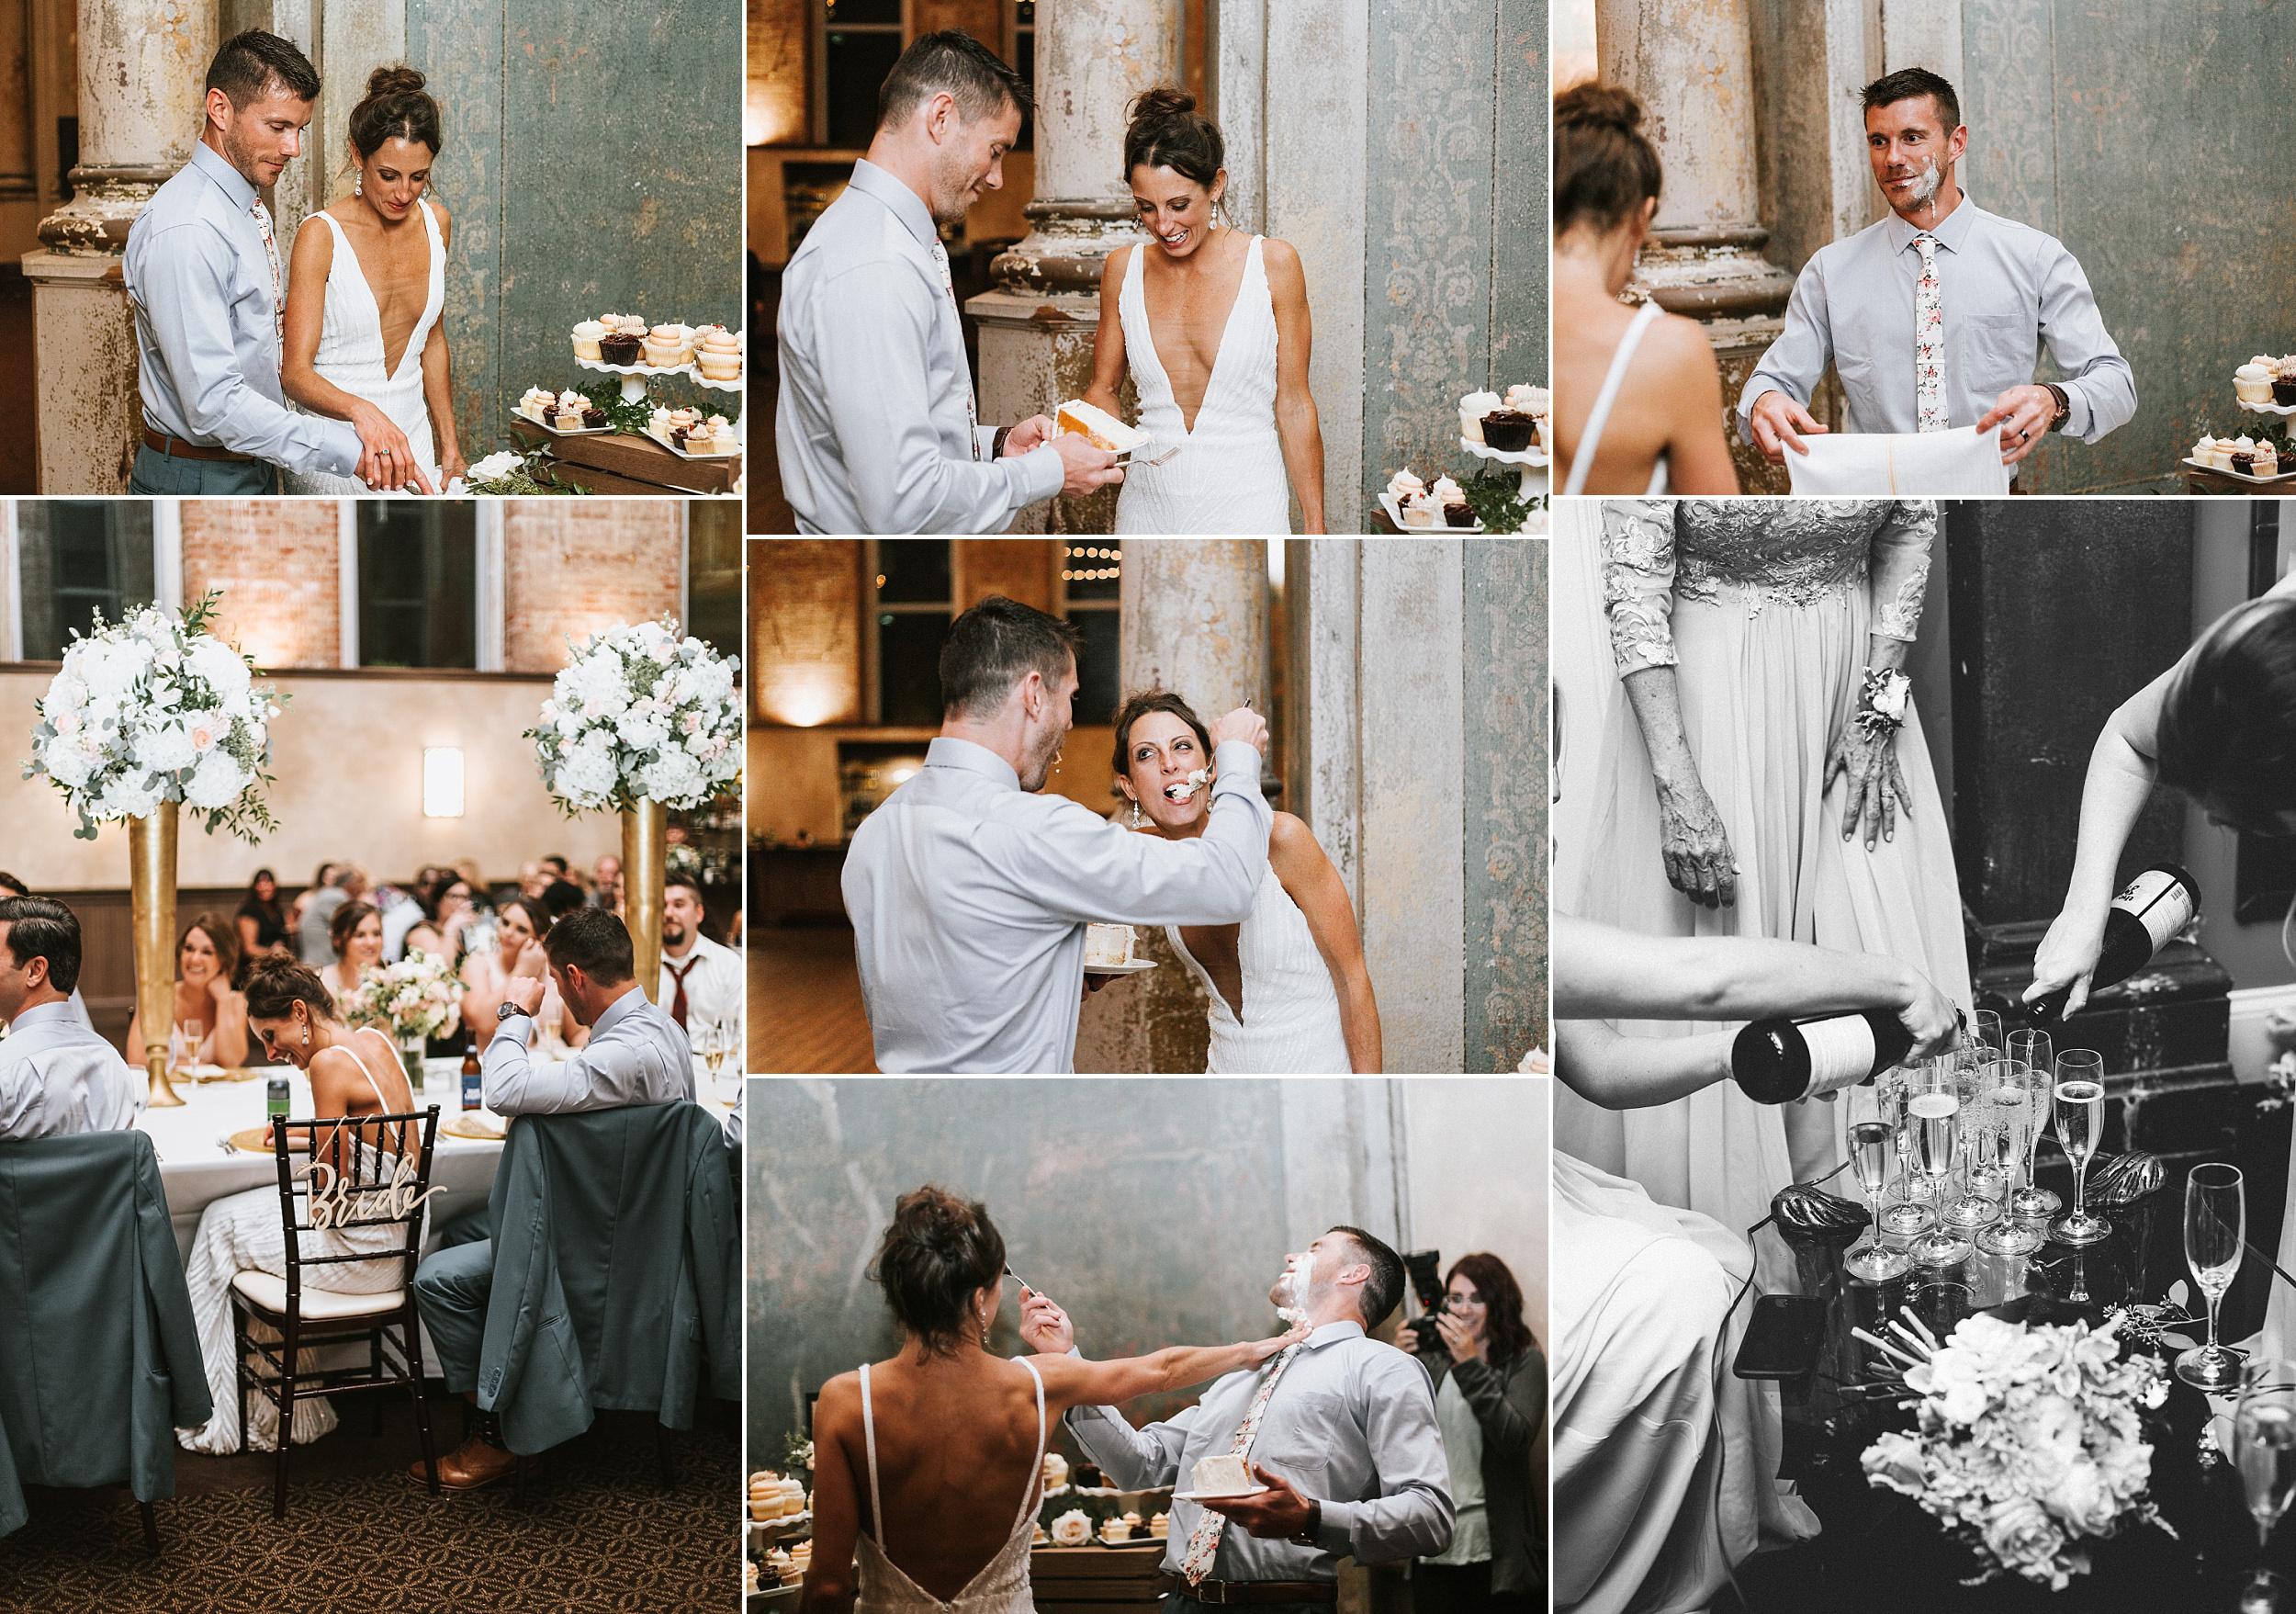 Brooke Townsend Photography - Cincinnati Wedding Photographer (151 of 170).jpg